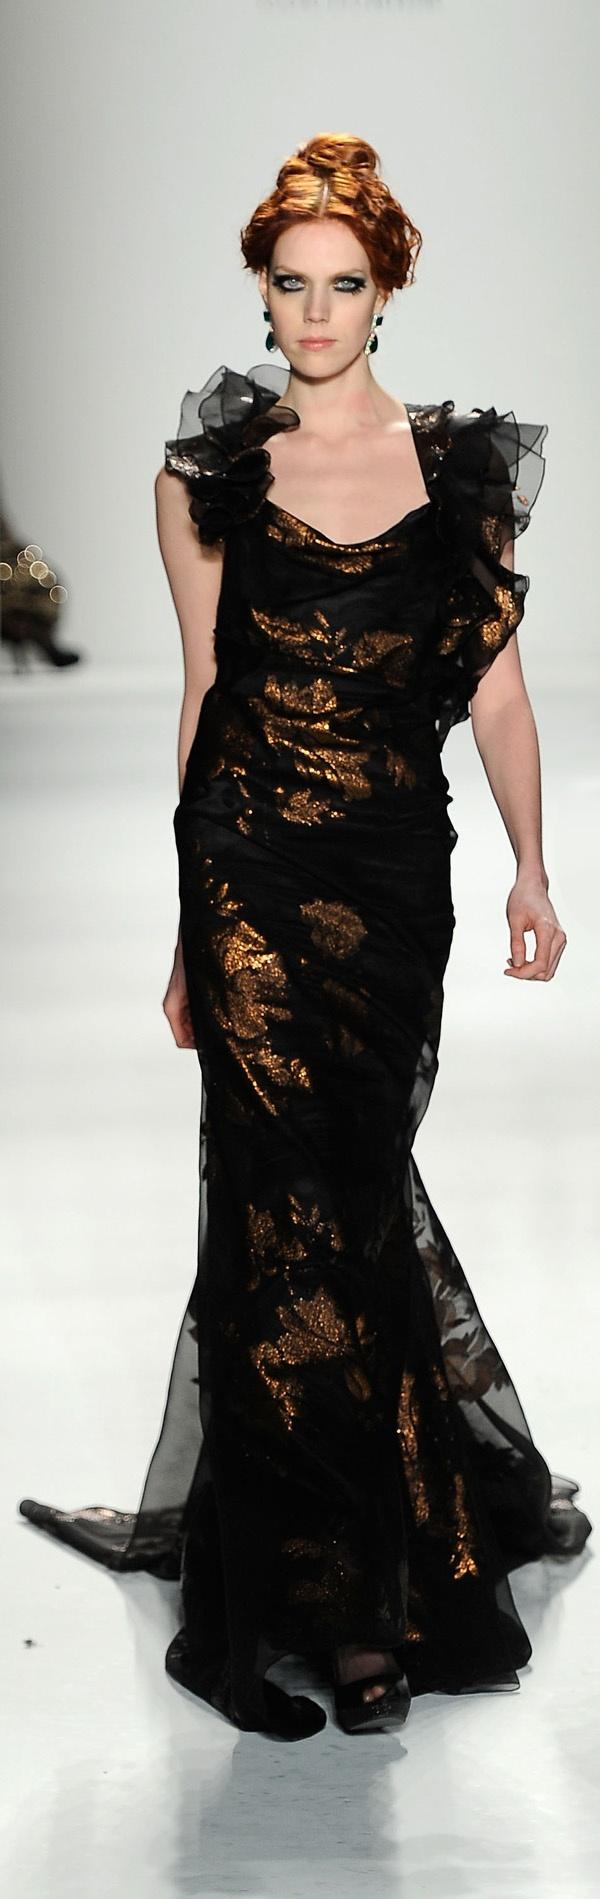 ❈ Venexiana NY Mercedes Benz Fashion Week 2012 ❈ http://www.epochtimes.com.ua/ru/fashion/shows/osen-2012-ot-venexiana--101522.html